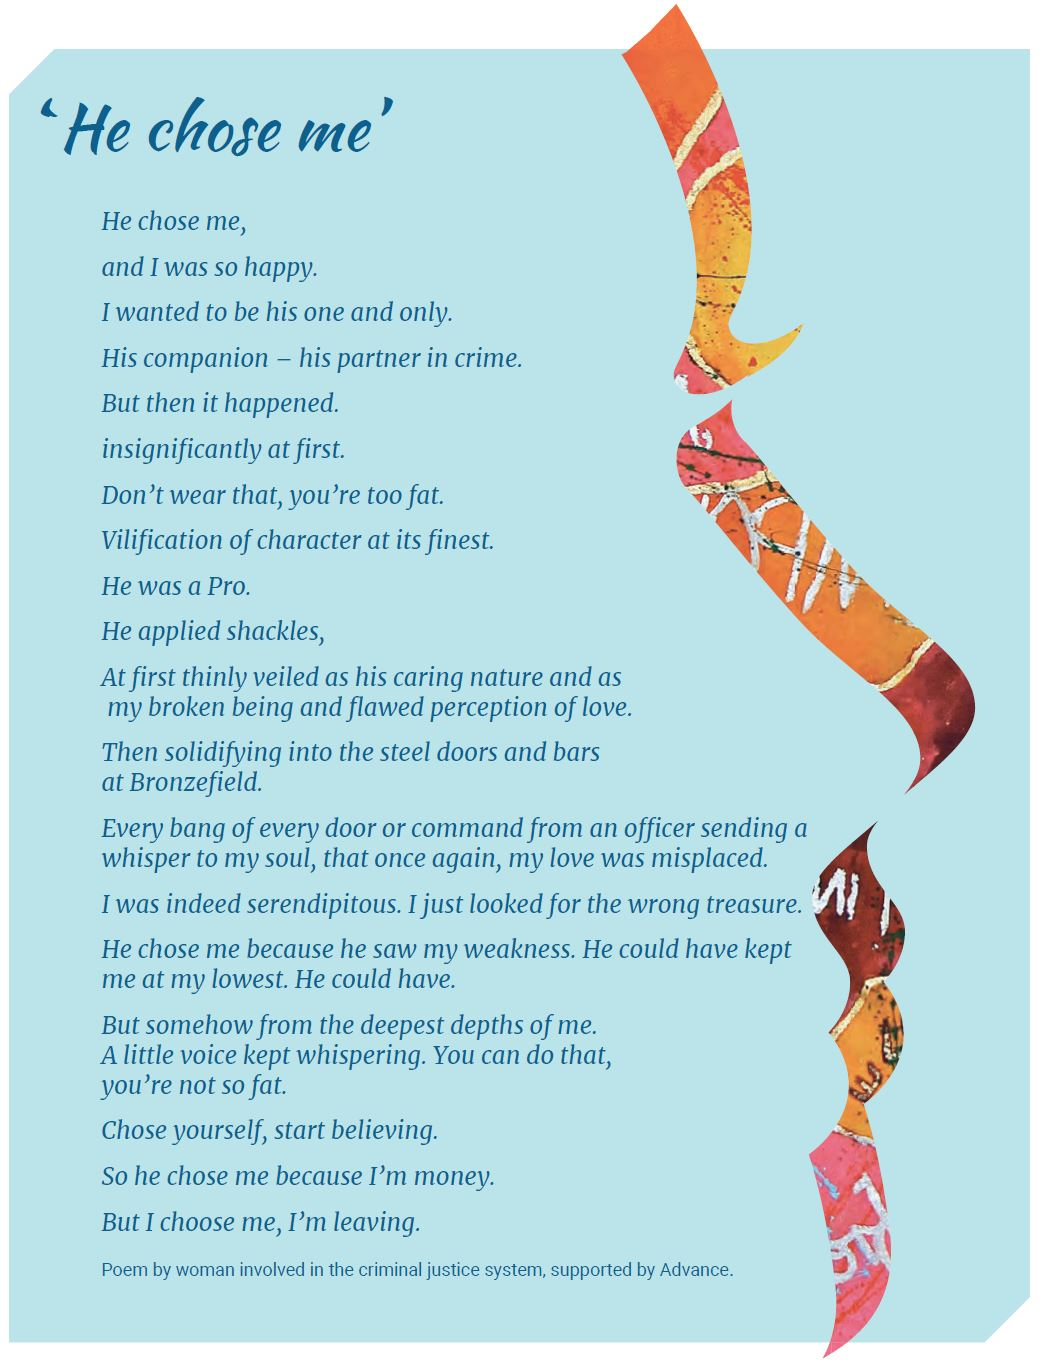 Advance poem